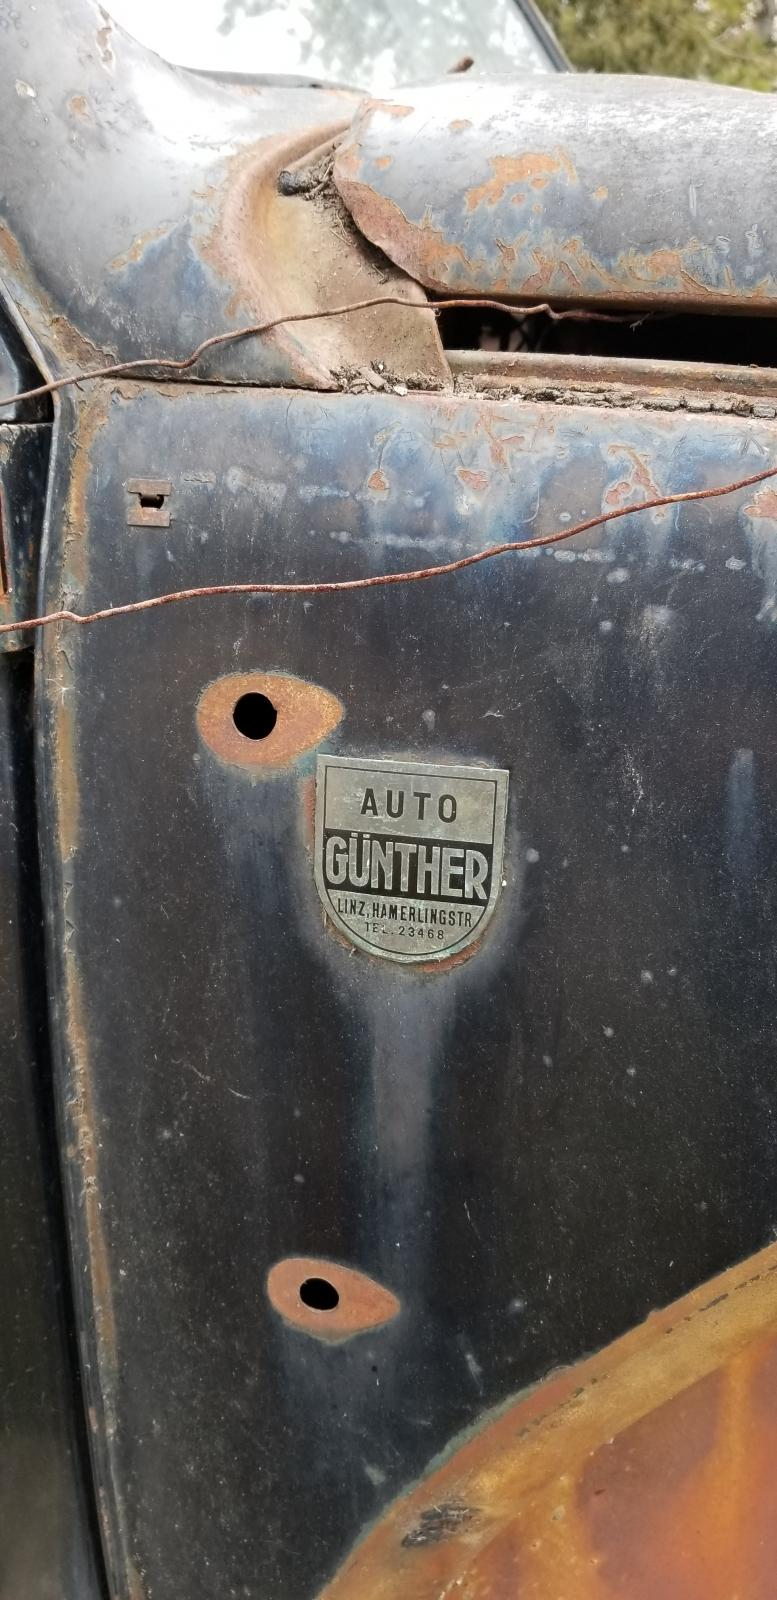 Auto Gunther VW dealership badge